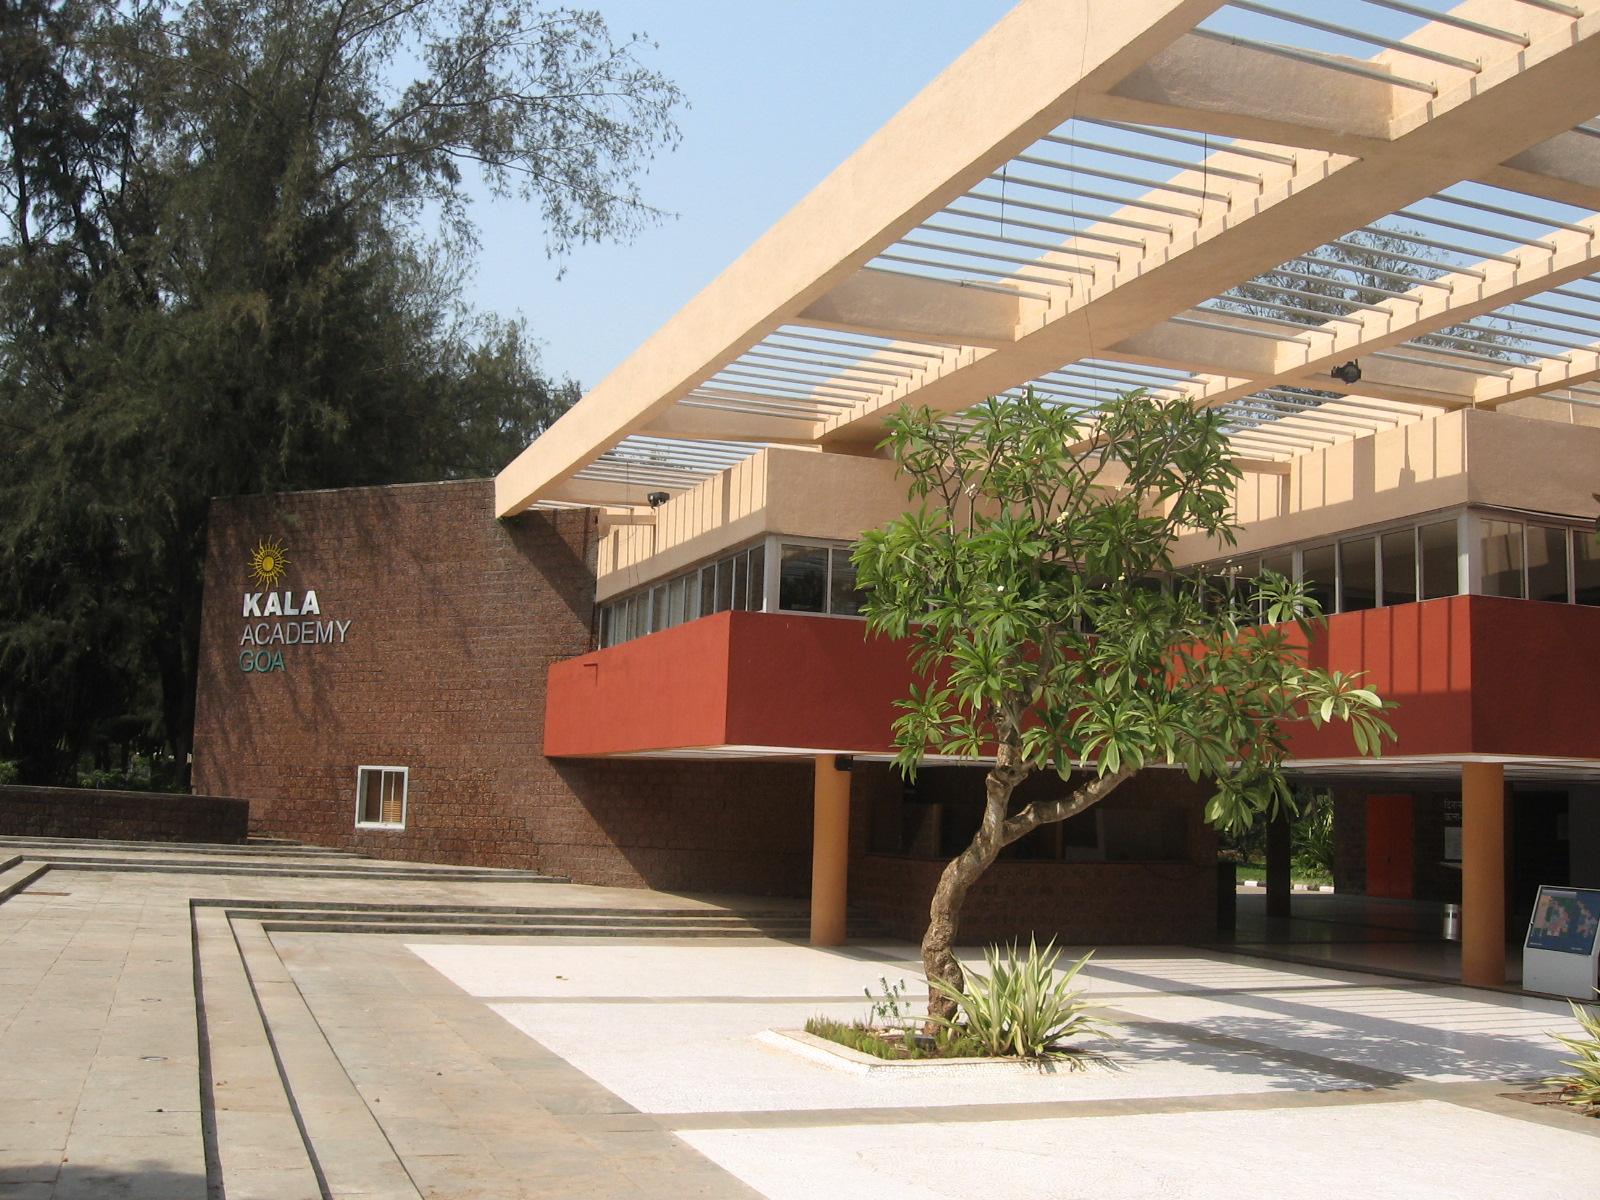 Famous Contemporary Architects Architecture Student S Corner Charles Correa Kala